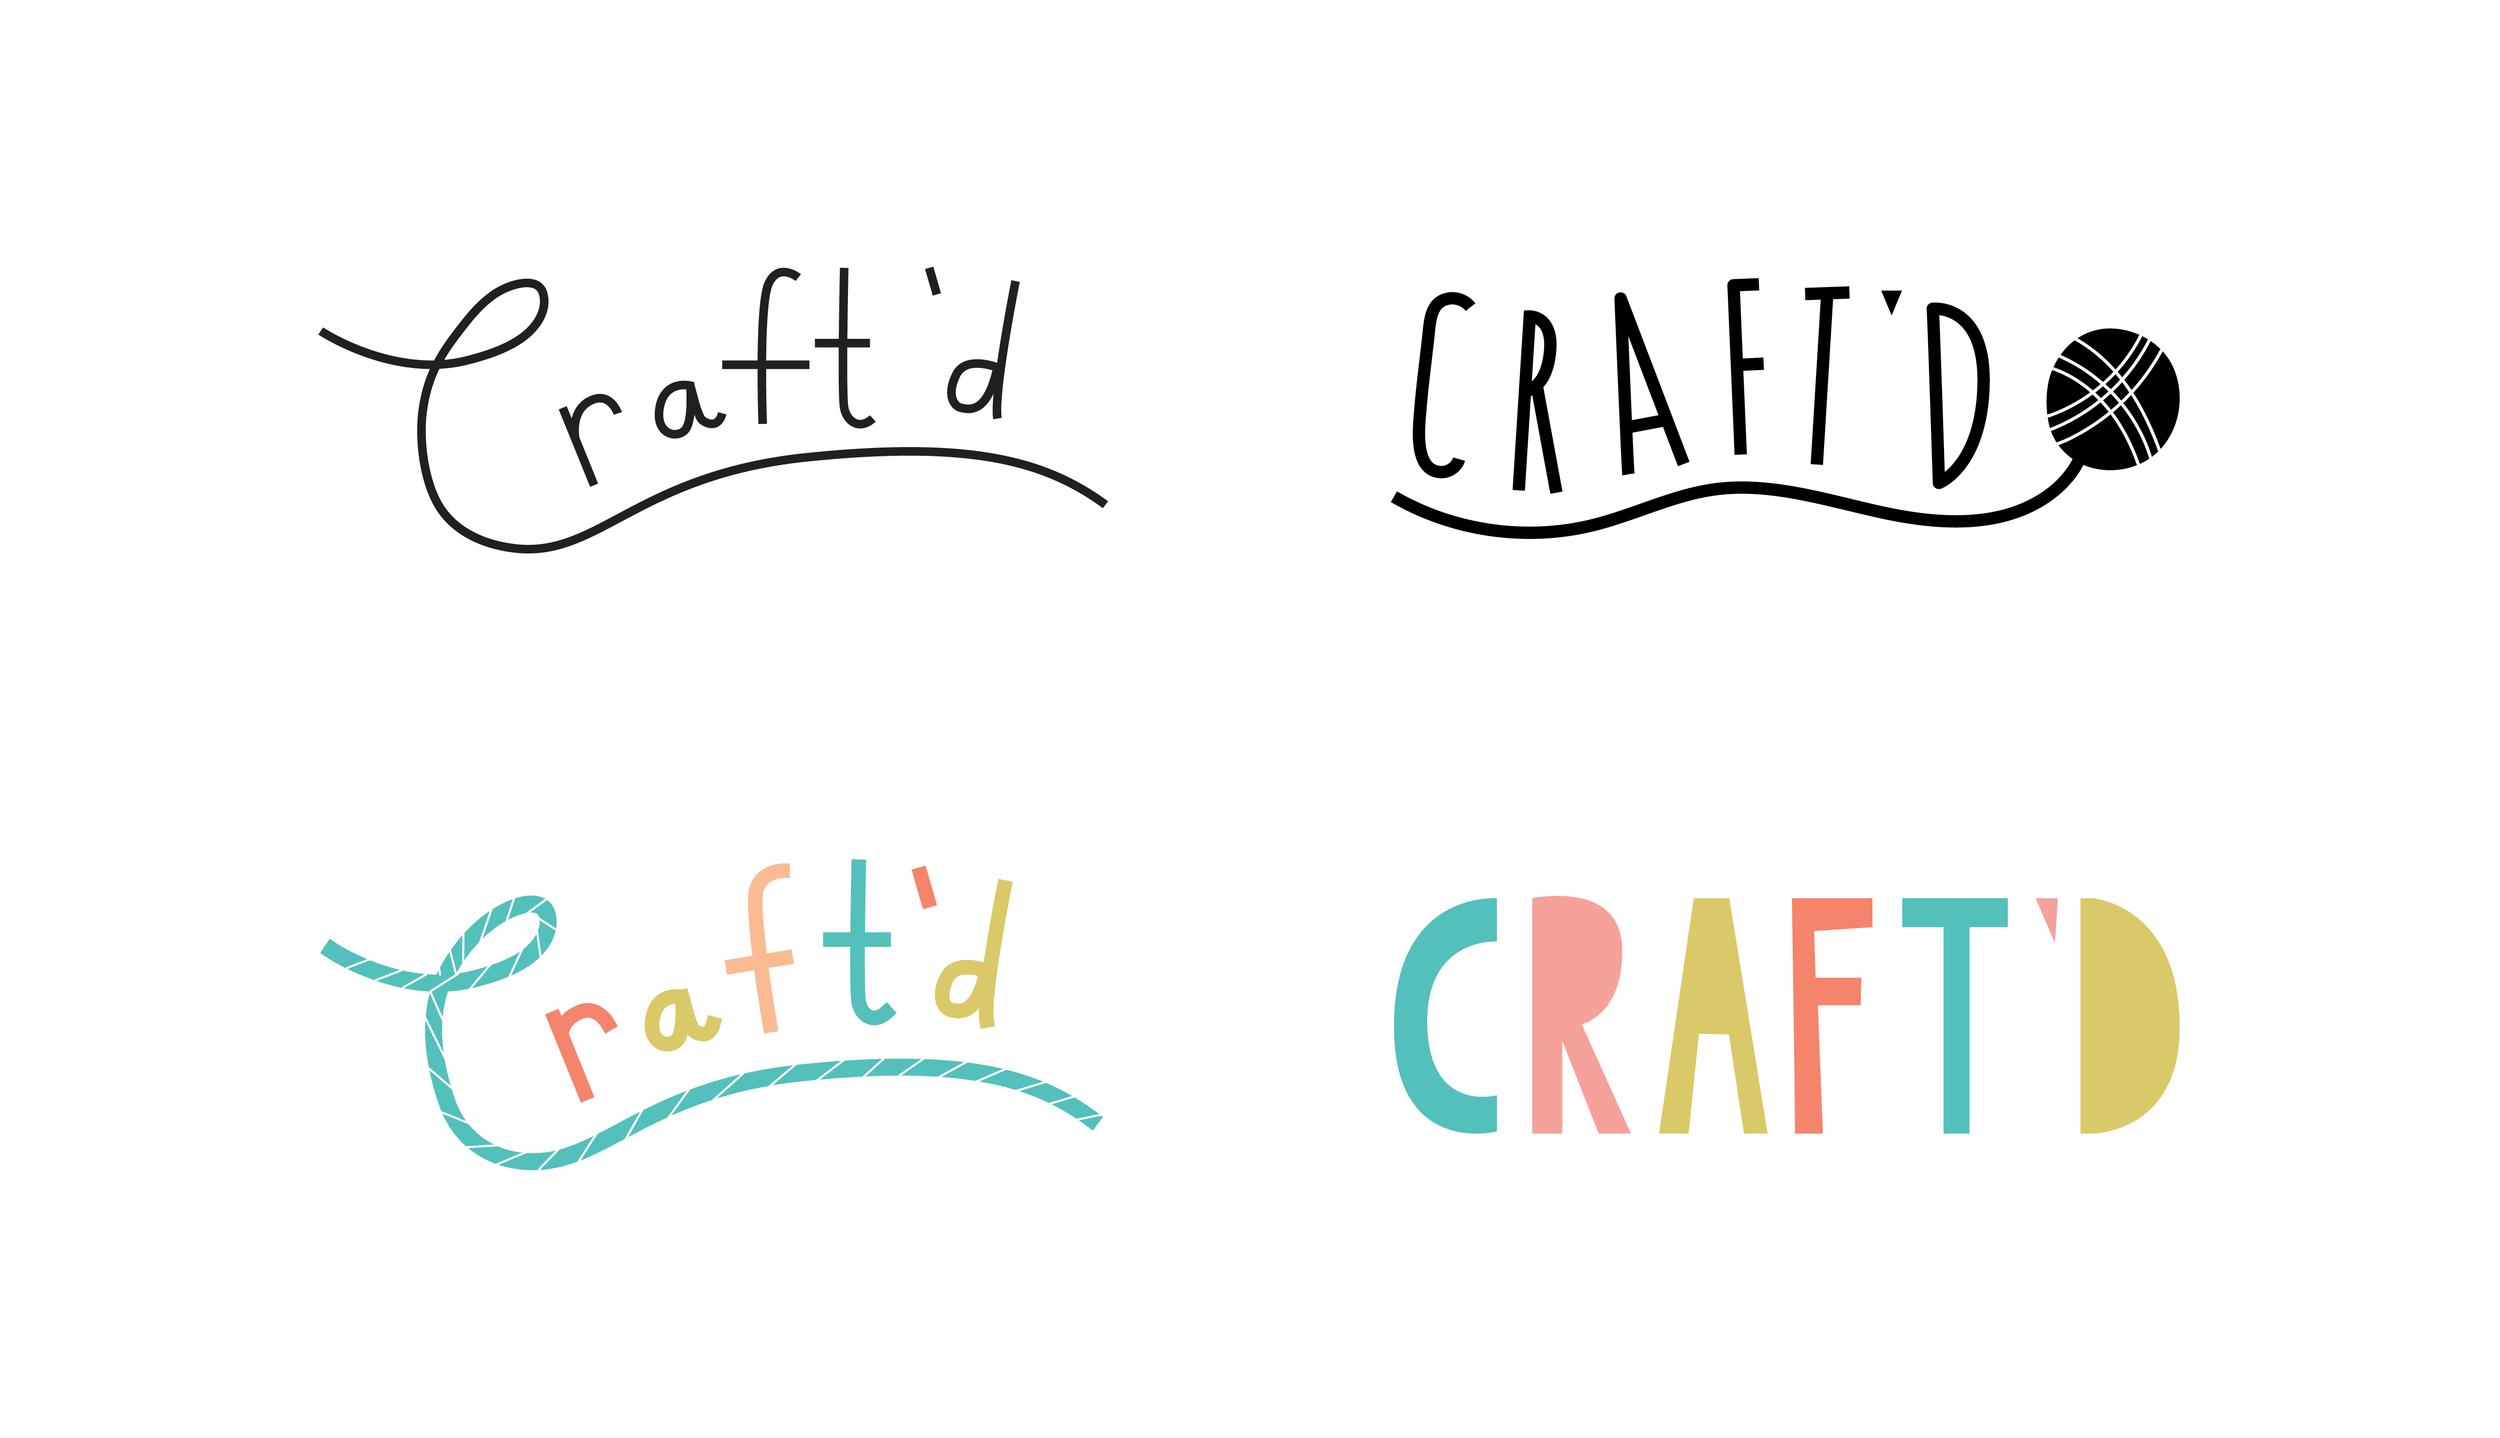 Lisa-claire-stewart-graphic-designer-cornwall-craftd-logos.png